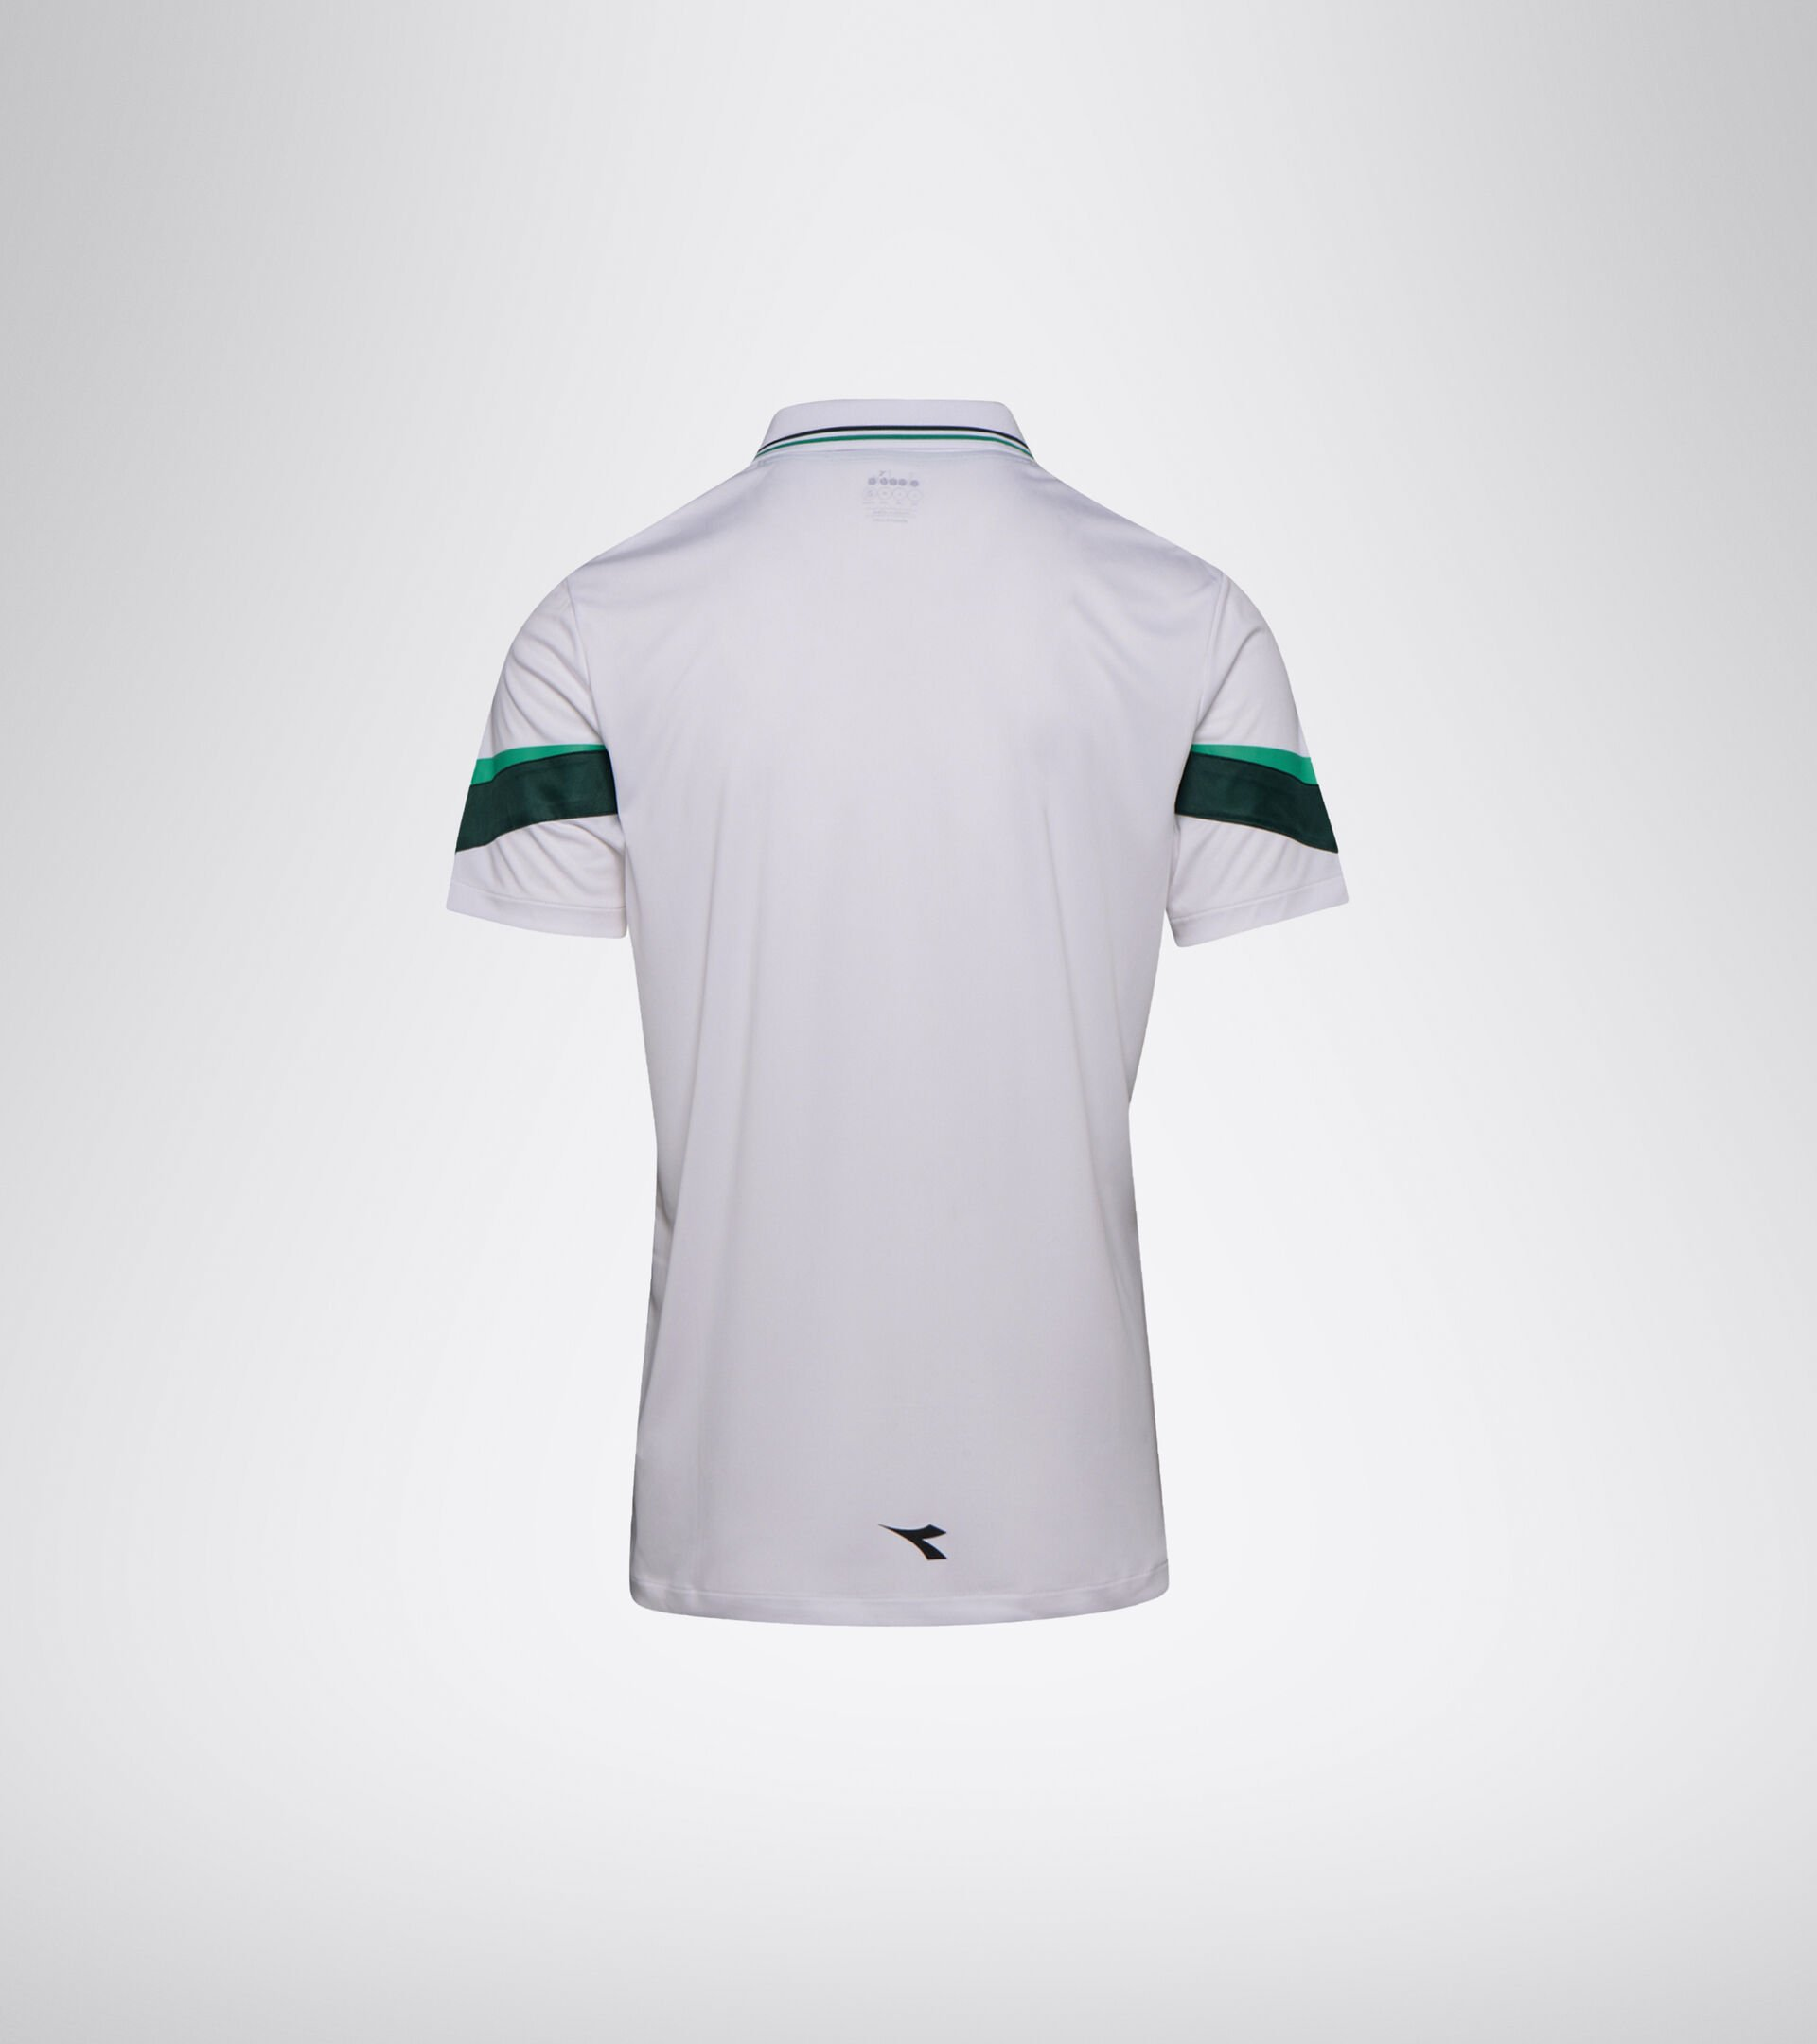 Tennis-Polohemd - Herren POLO SS STECHPALMEGRUN/WSS/BISTRO GRN - Diadora